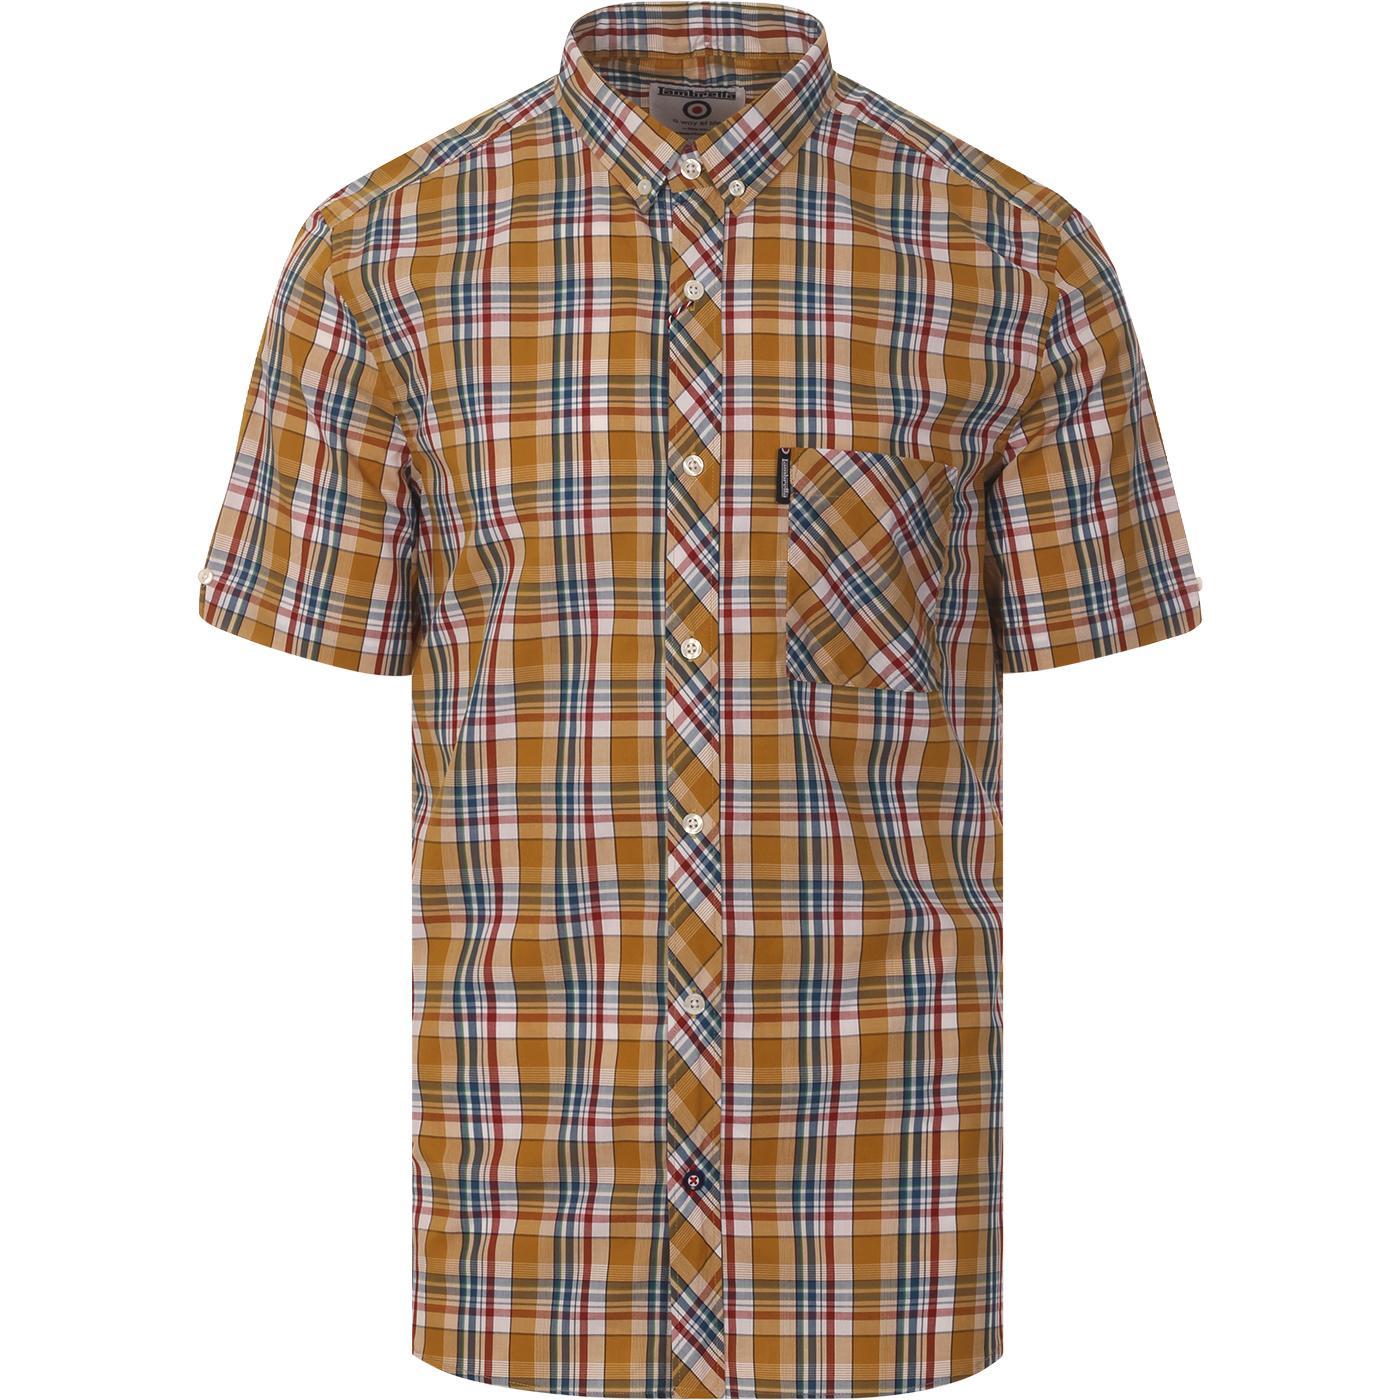 LAMBRETTA Mod S/S Plaid Check Shirt (Mustard)